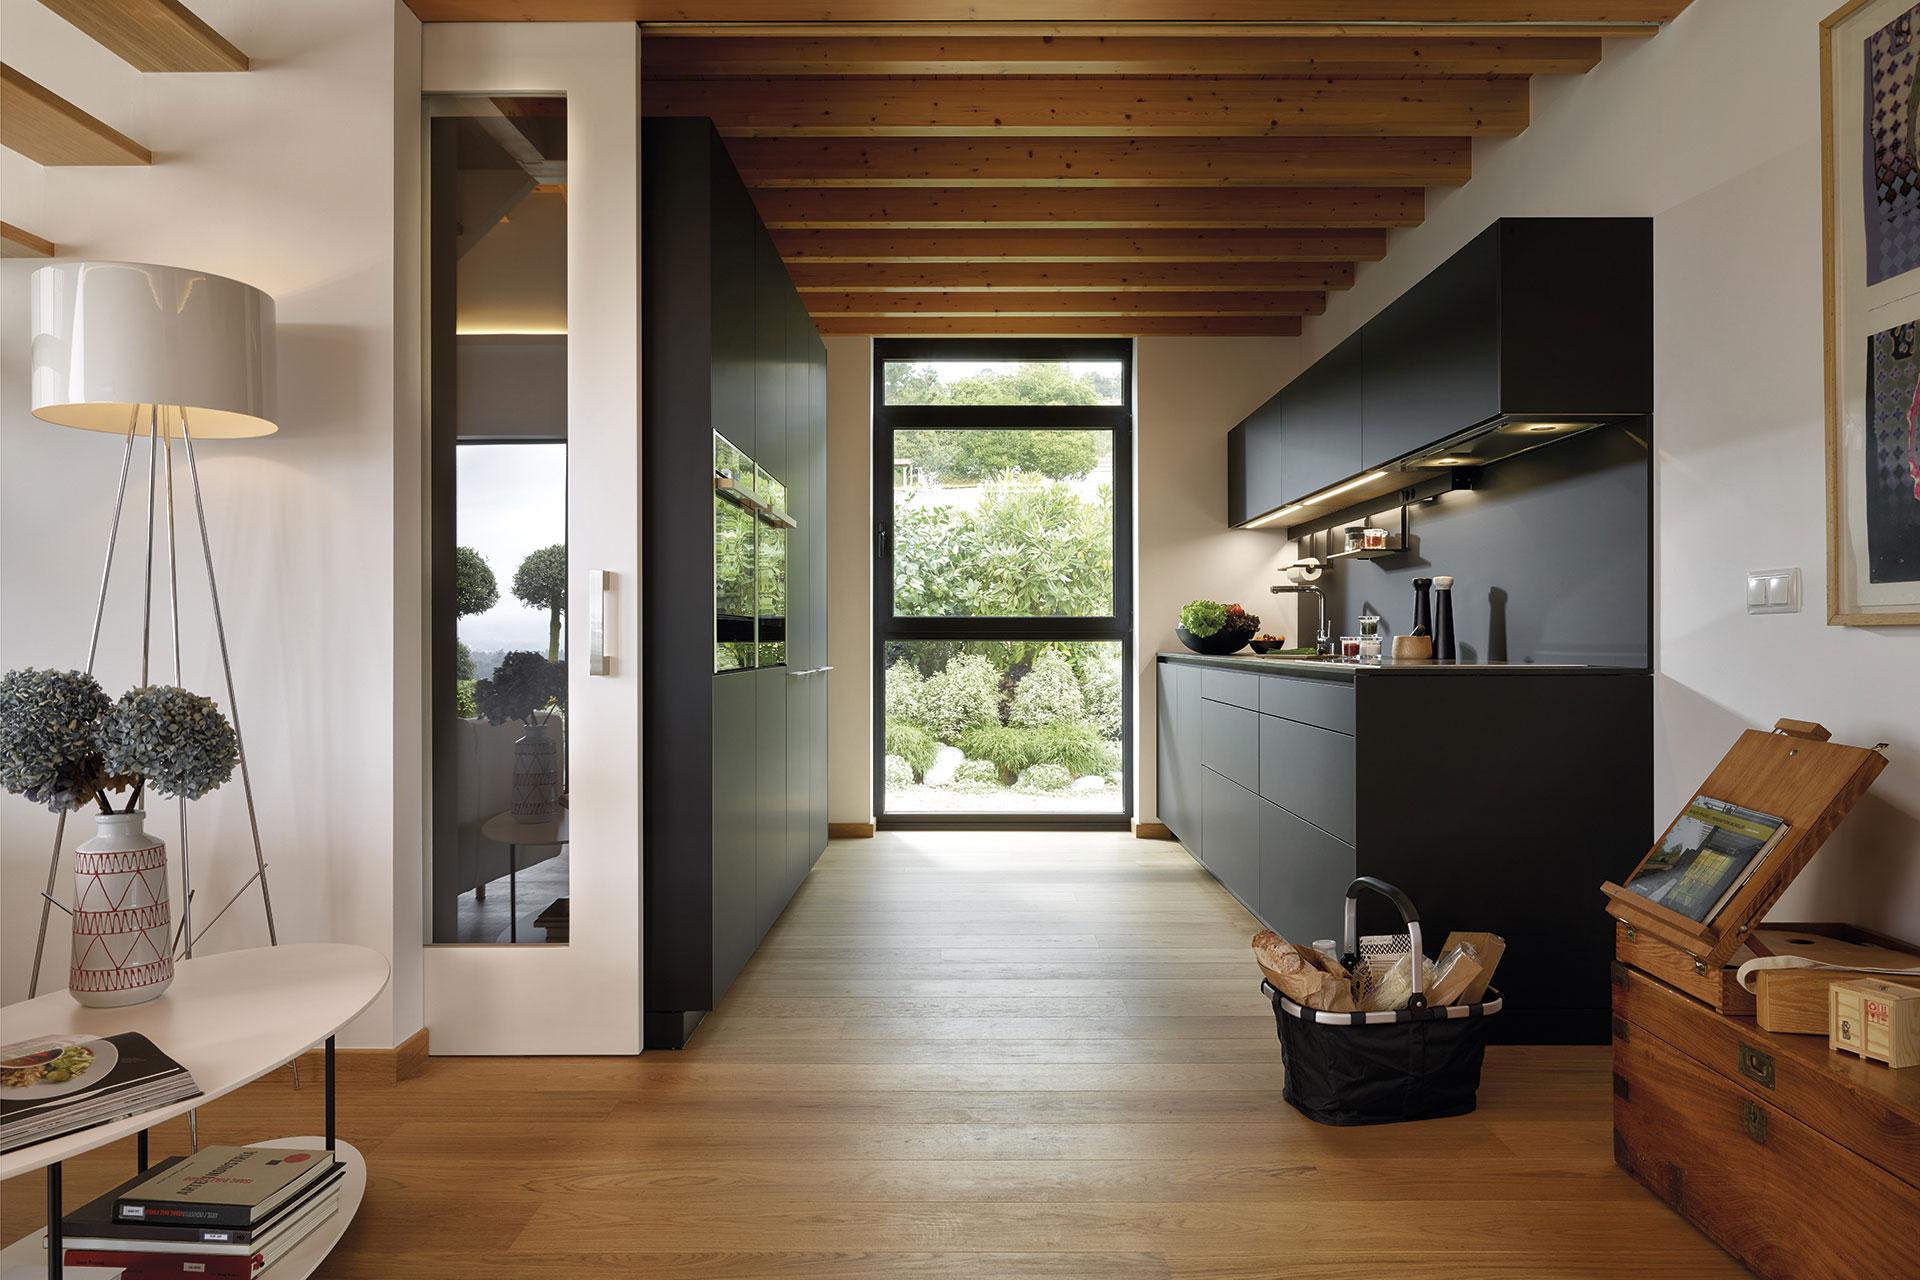 suelo-madera-cocina-line-negra-santos